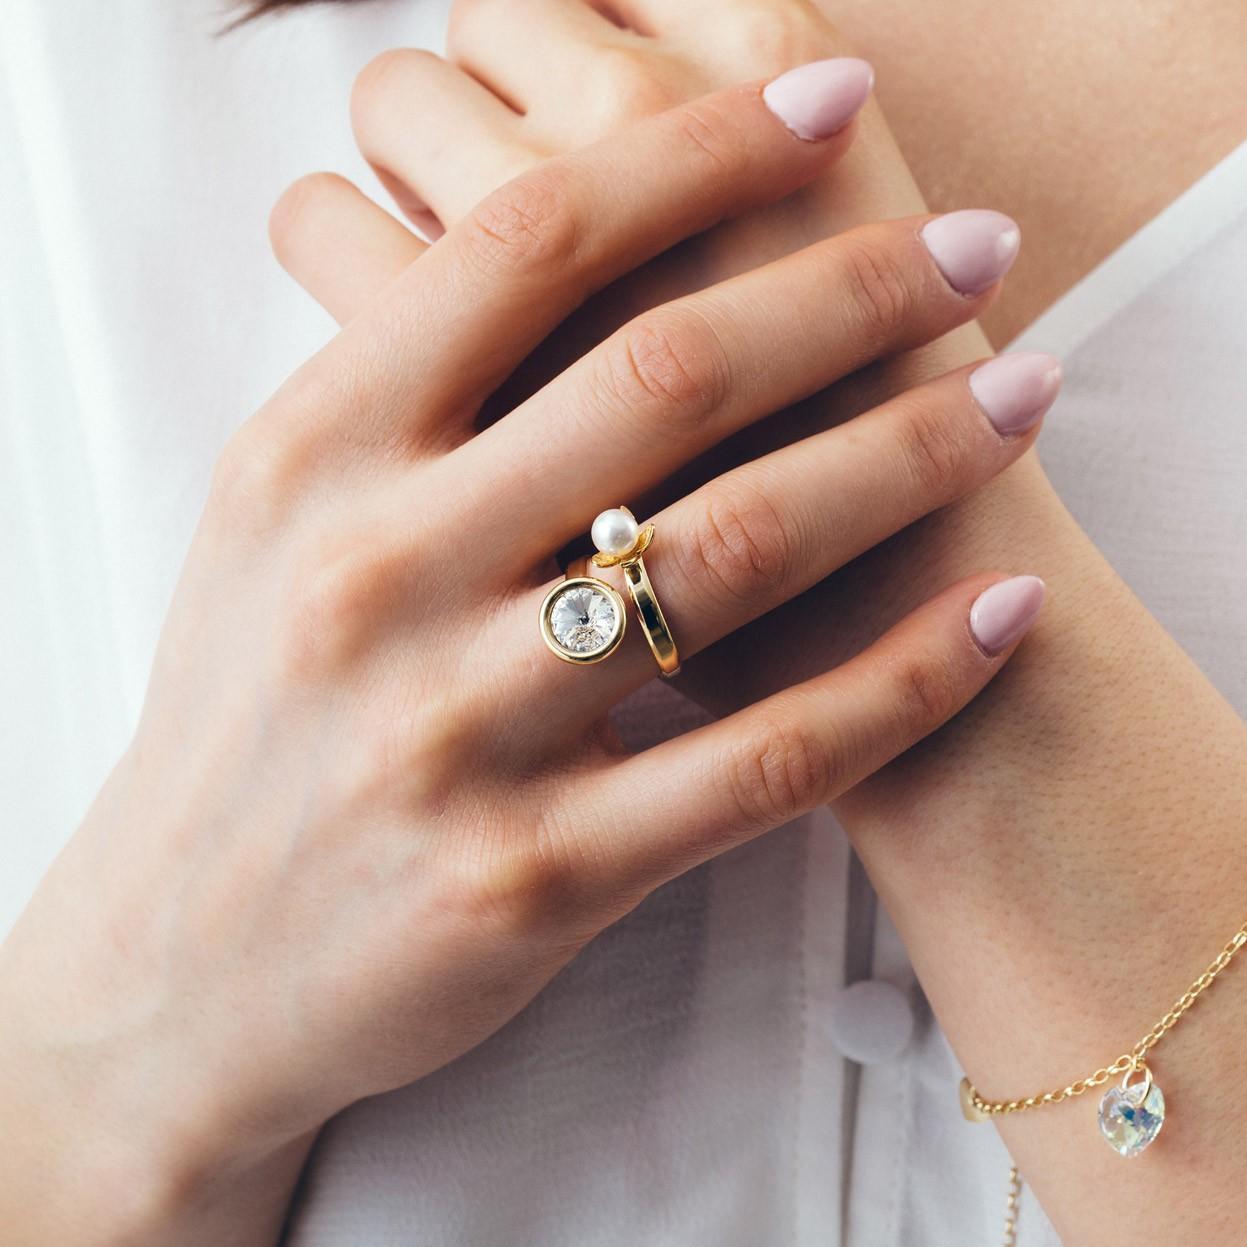 Srebrny pierścionek z perłą i kryształem, srebro 925